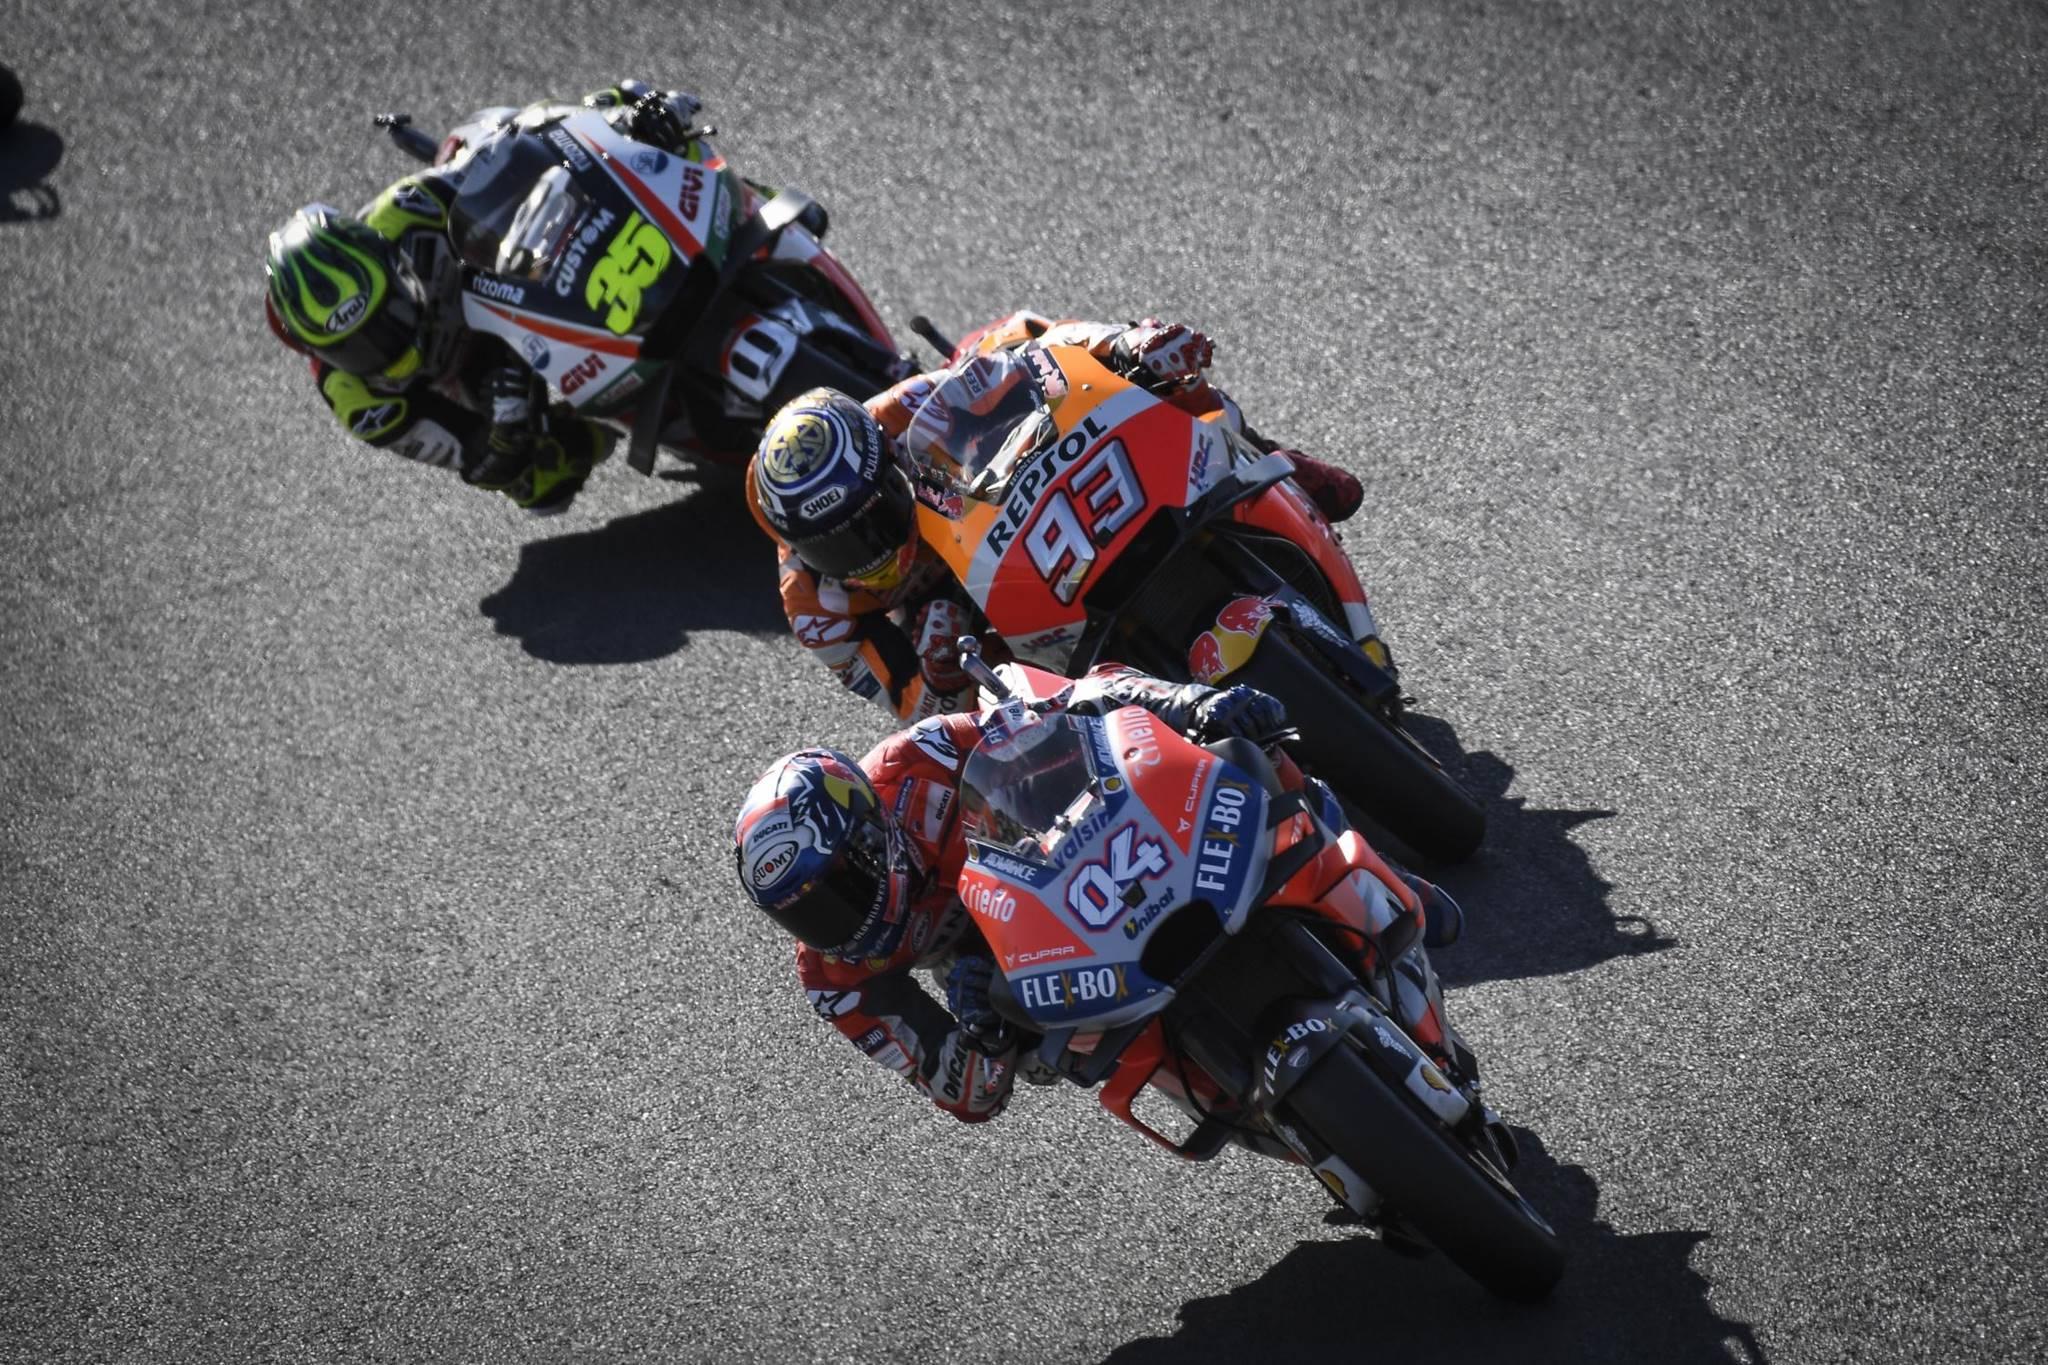 MotoGP_2018_JapaneseGP_Xe_Tinhte_014.jpg